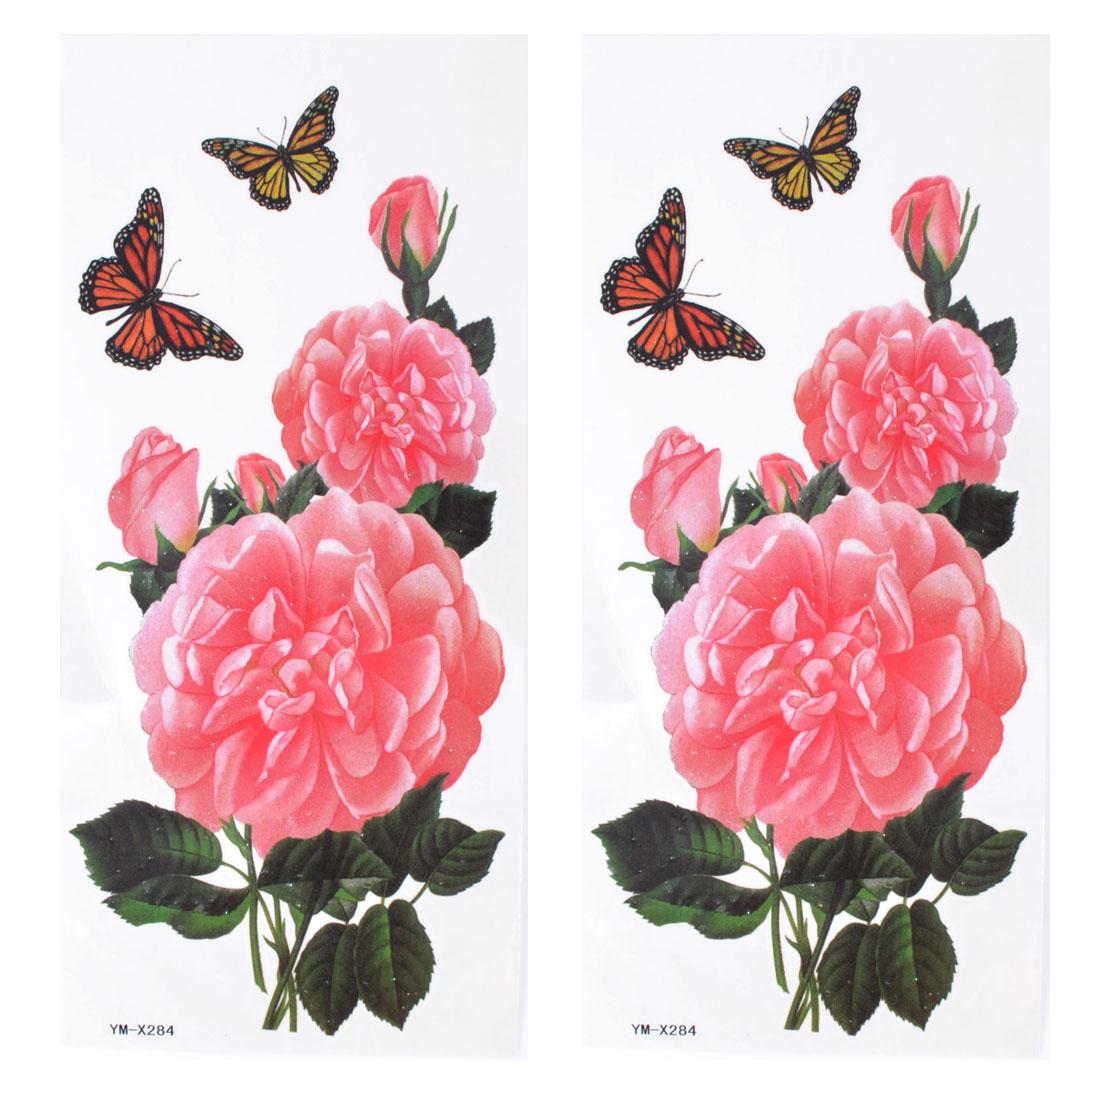 Pink Peony Flower Print Waterproof Temporary Tattoo Transfer Sticker 2 Pcs